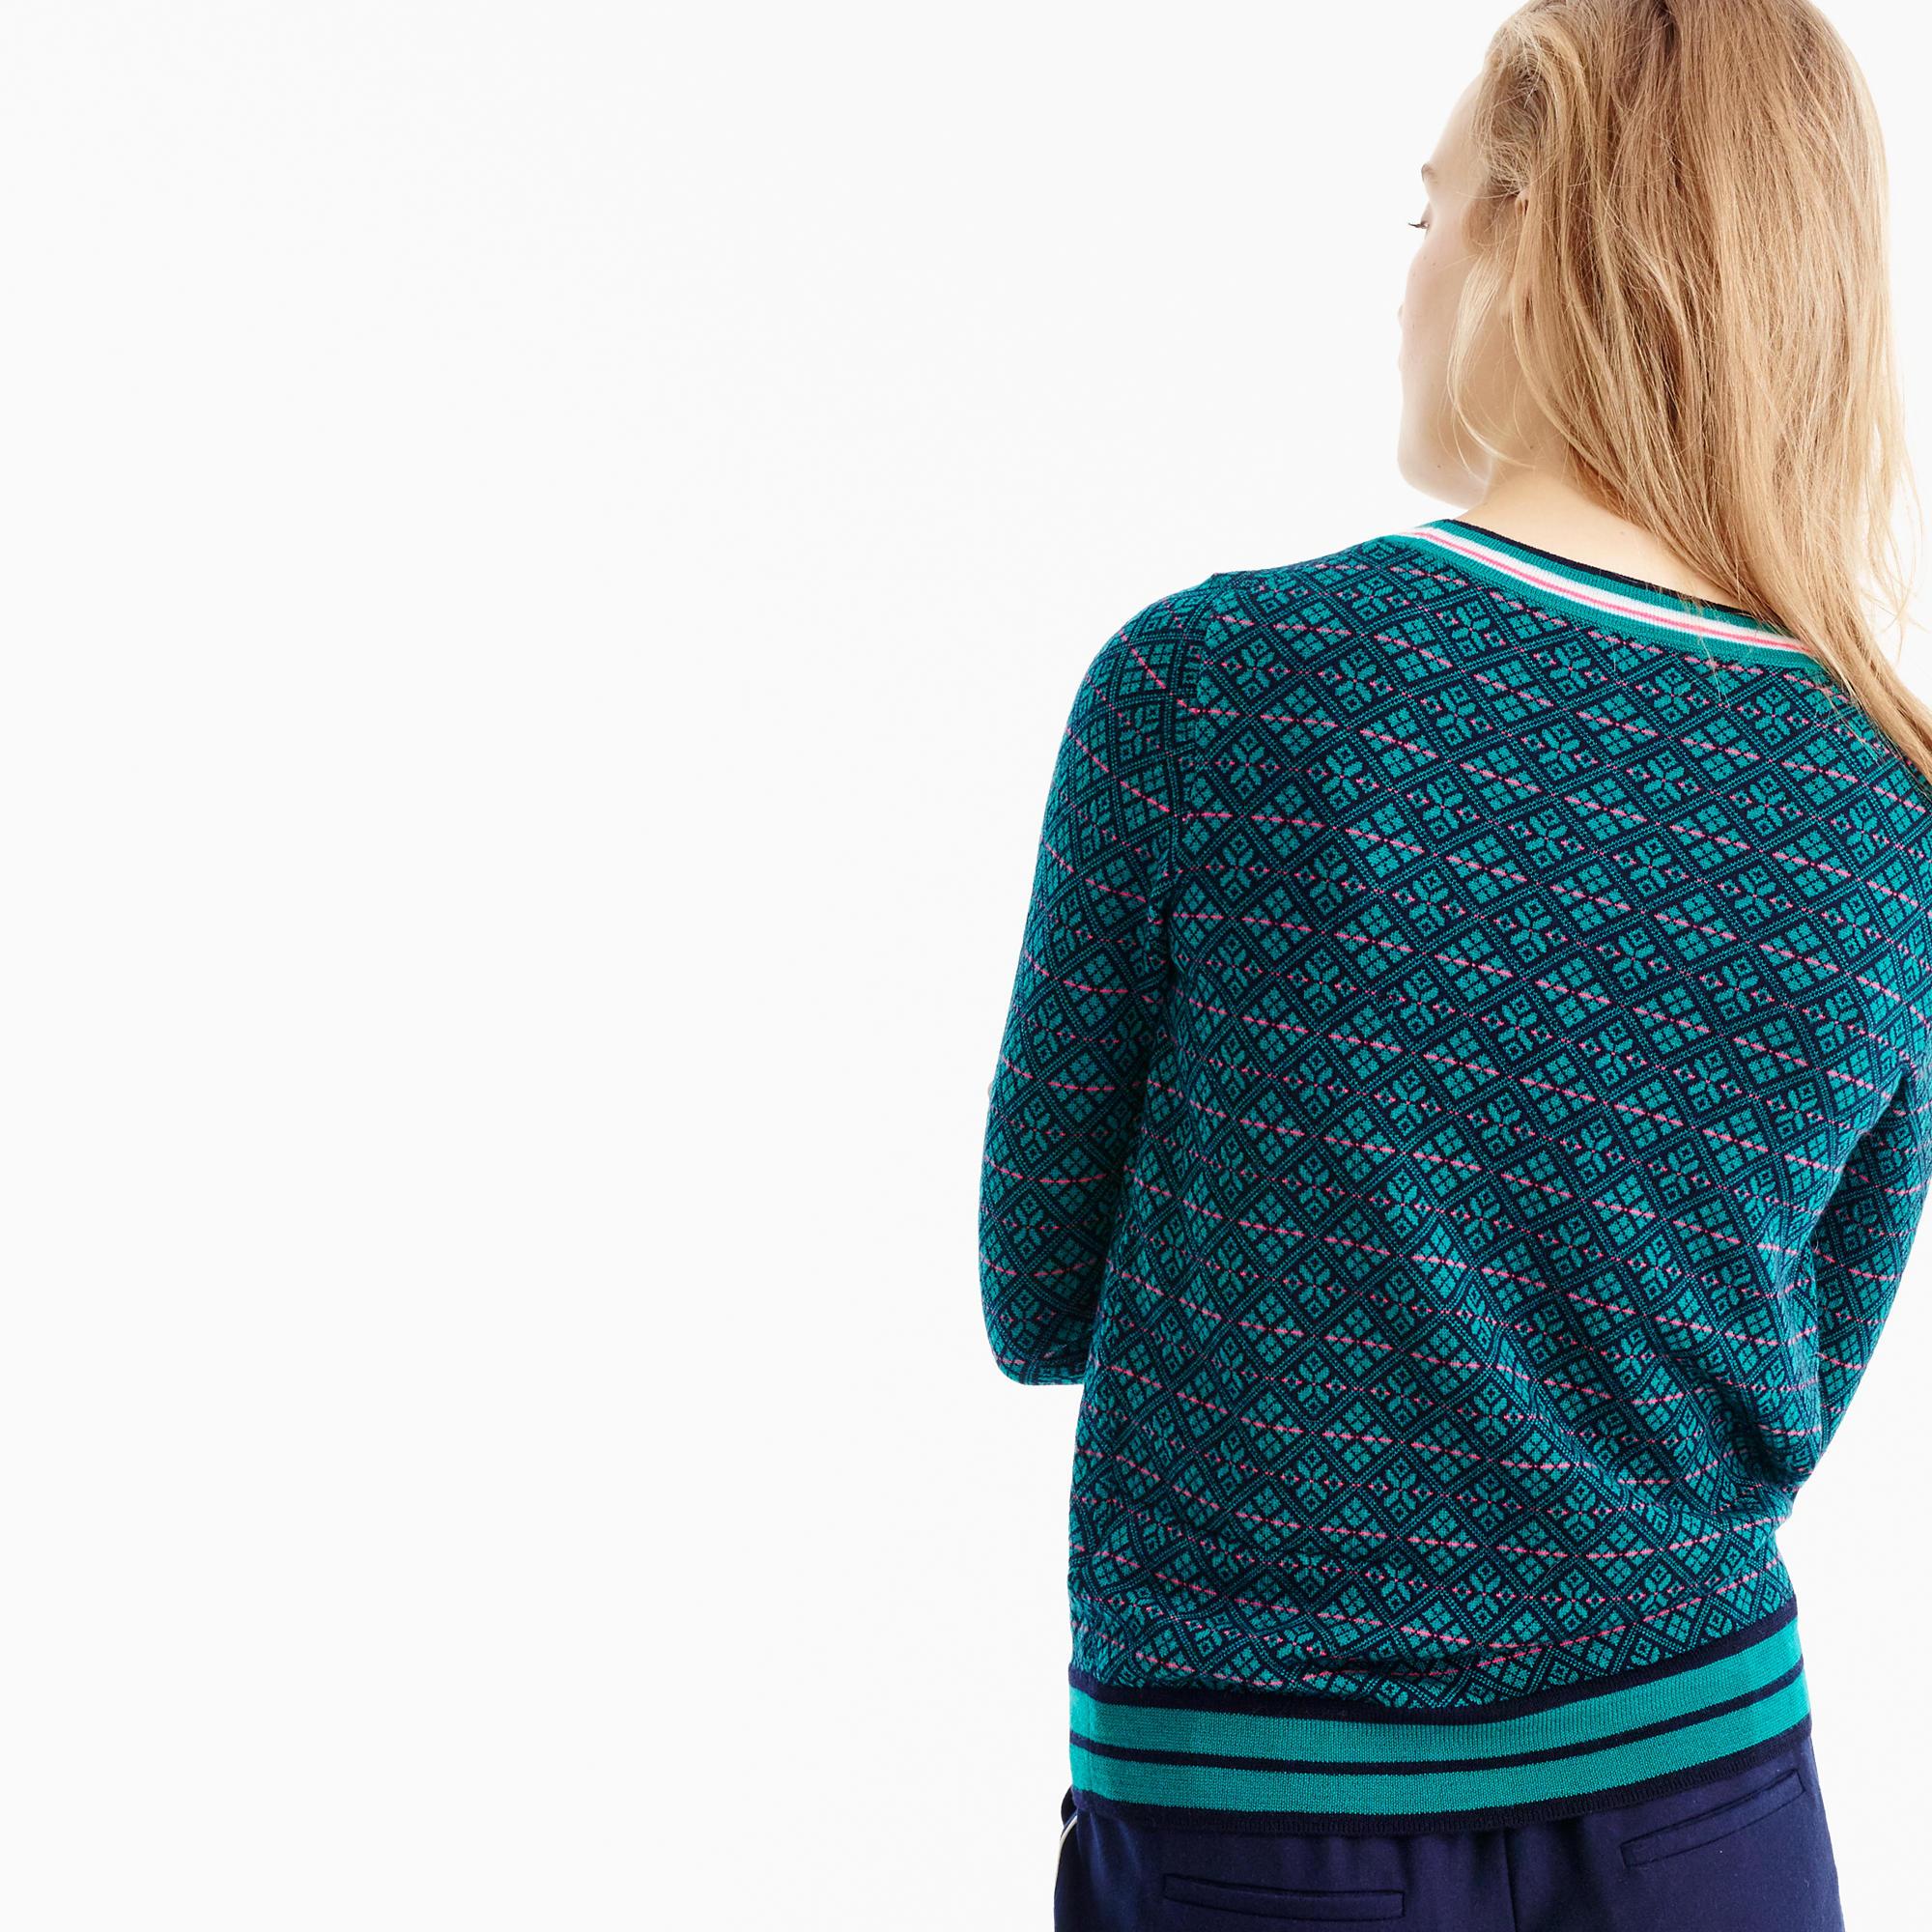 Tippi Sweater In Festive Fair Isle : Women's Sweaters   J.Crew